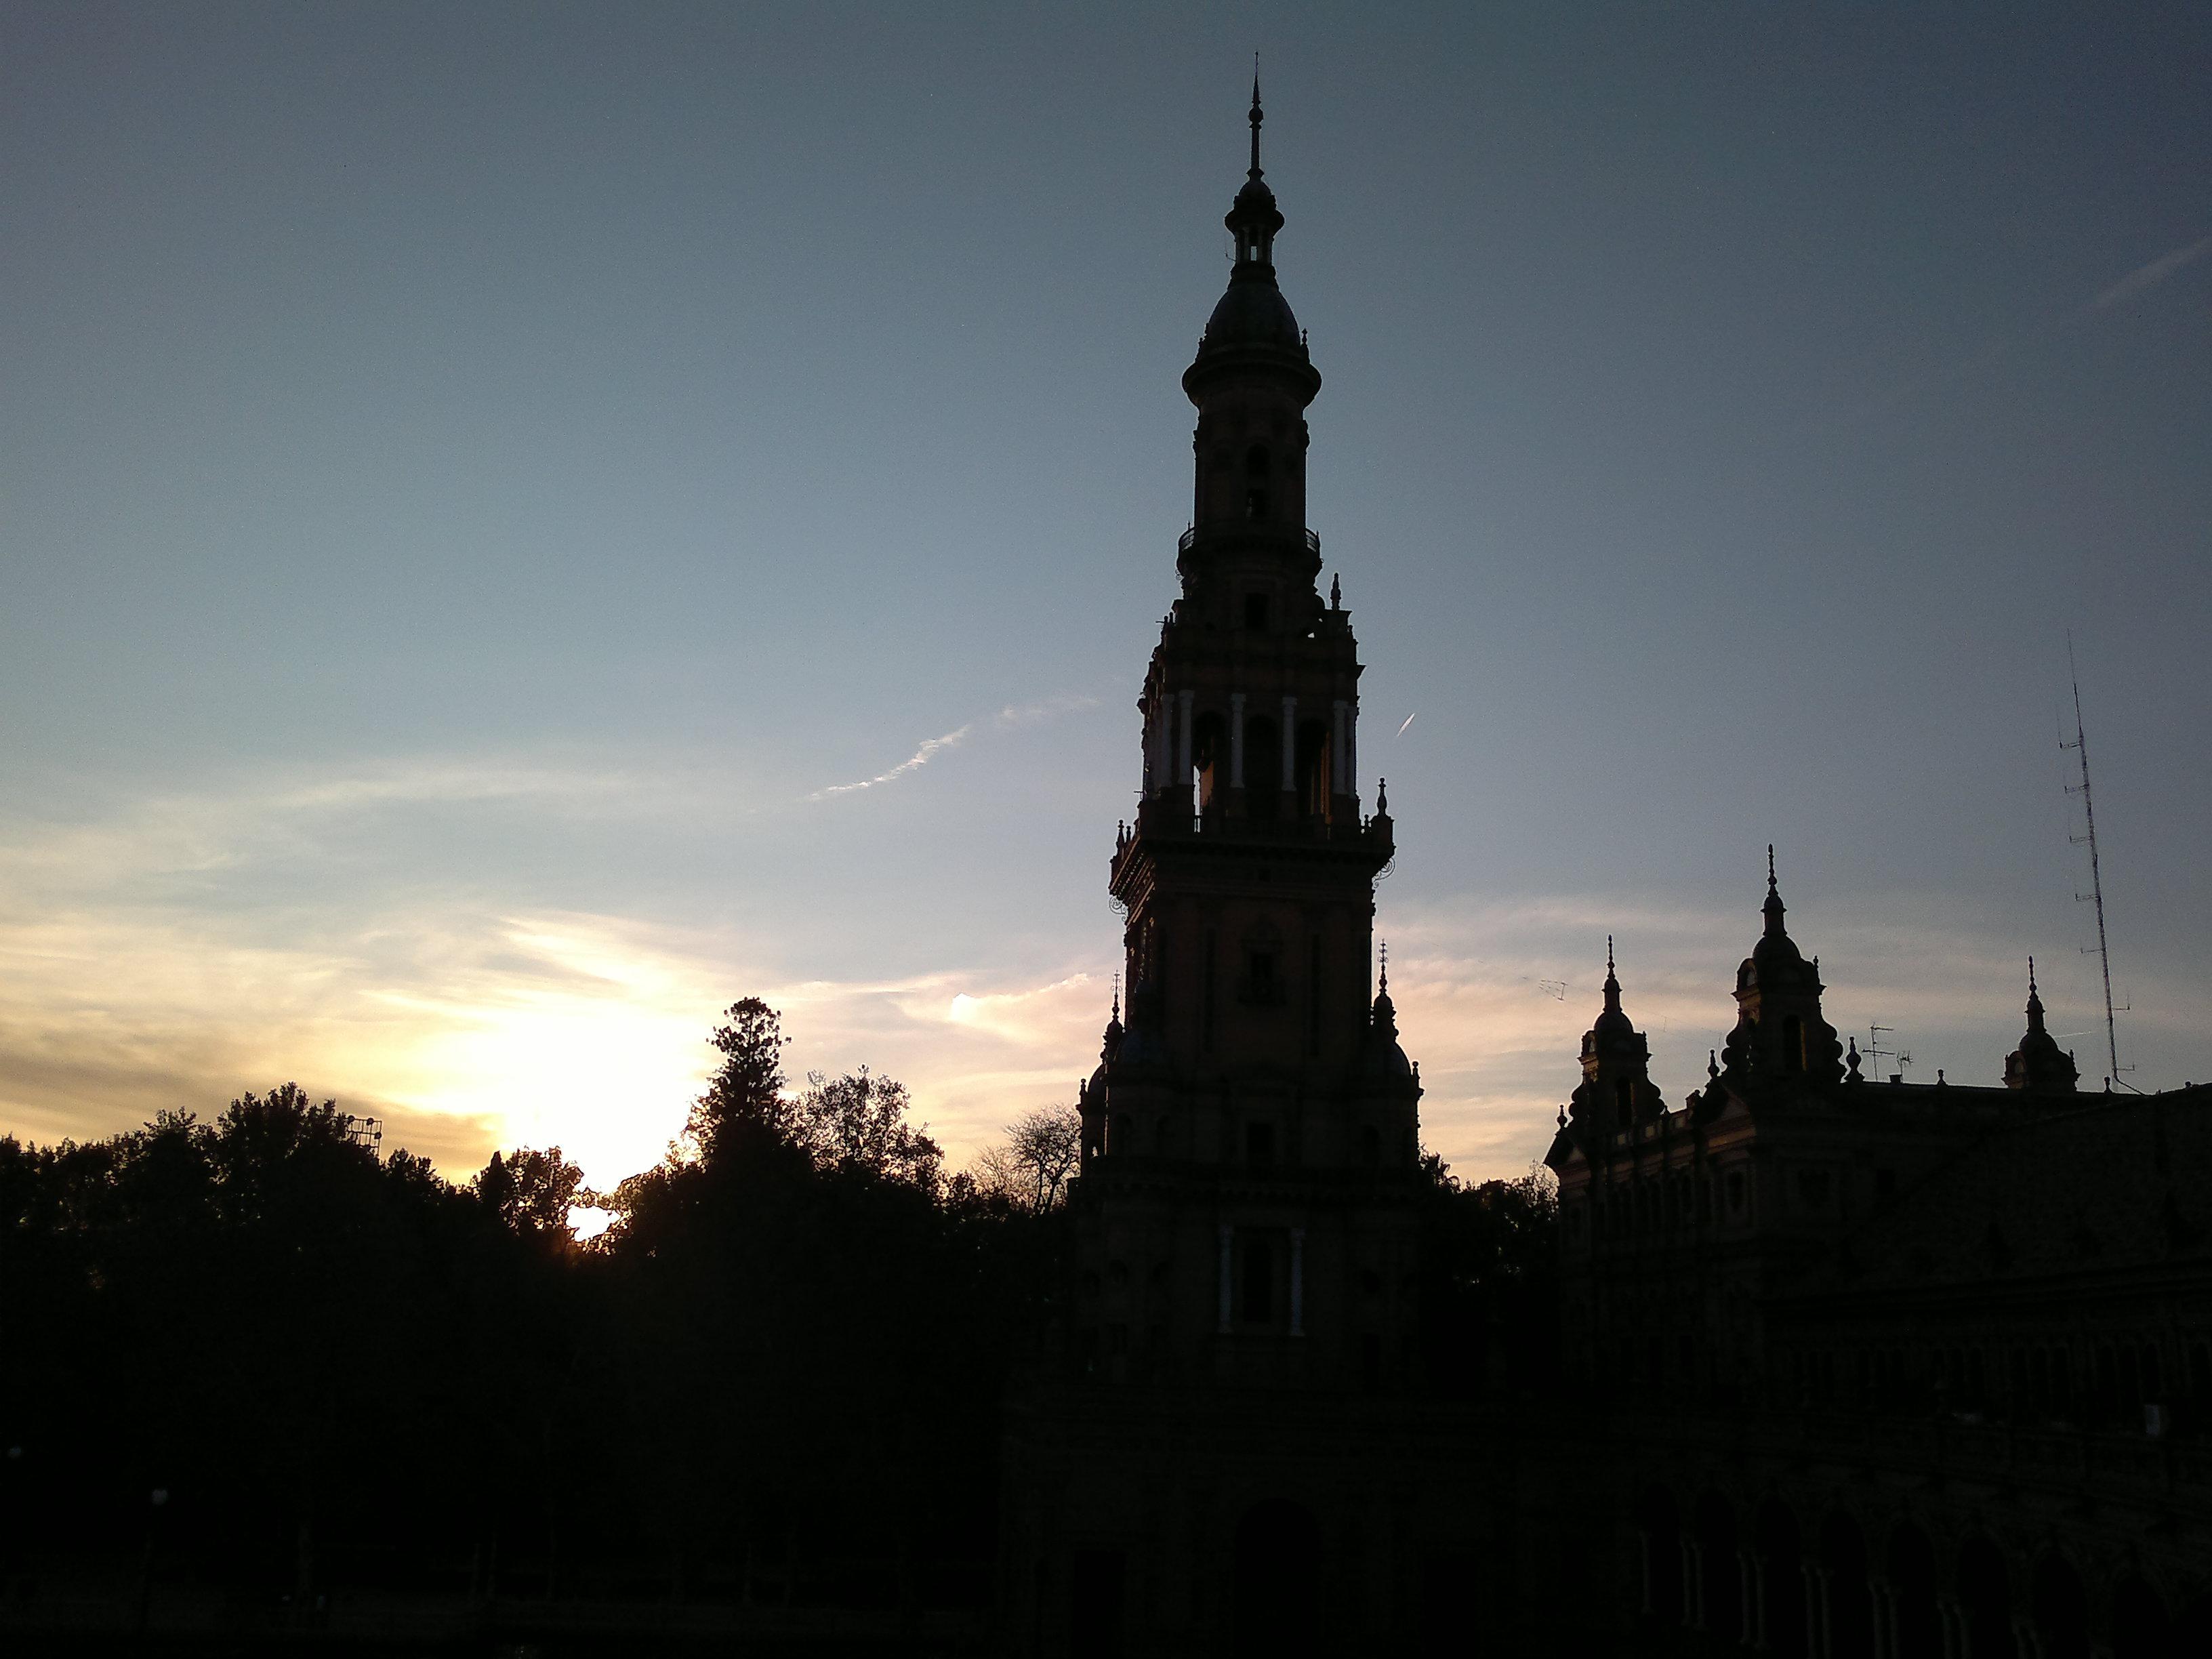 Atardecer en la Plaza de España de Sevilla